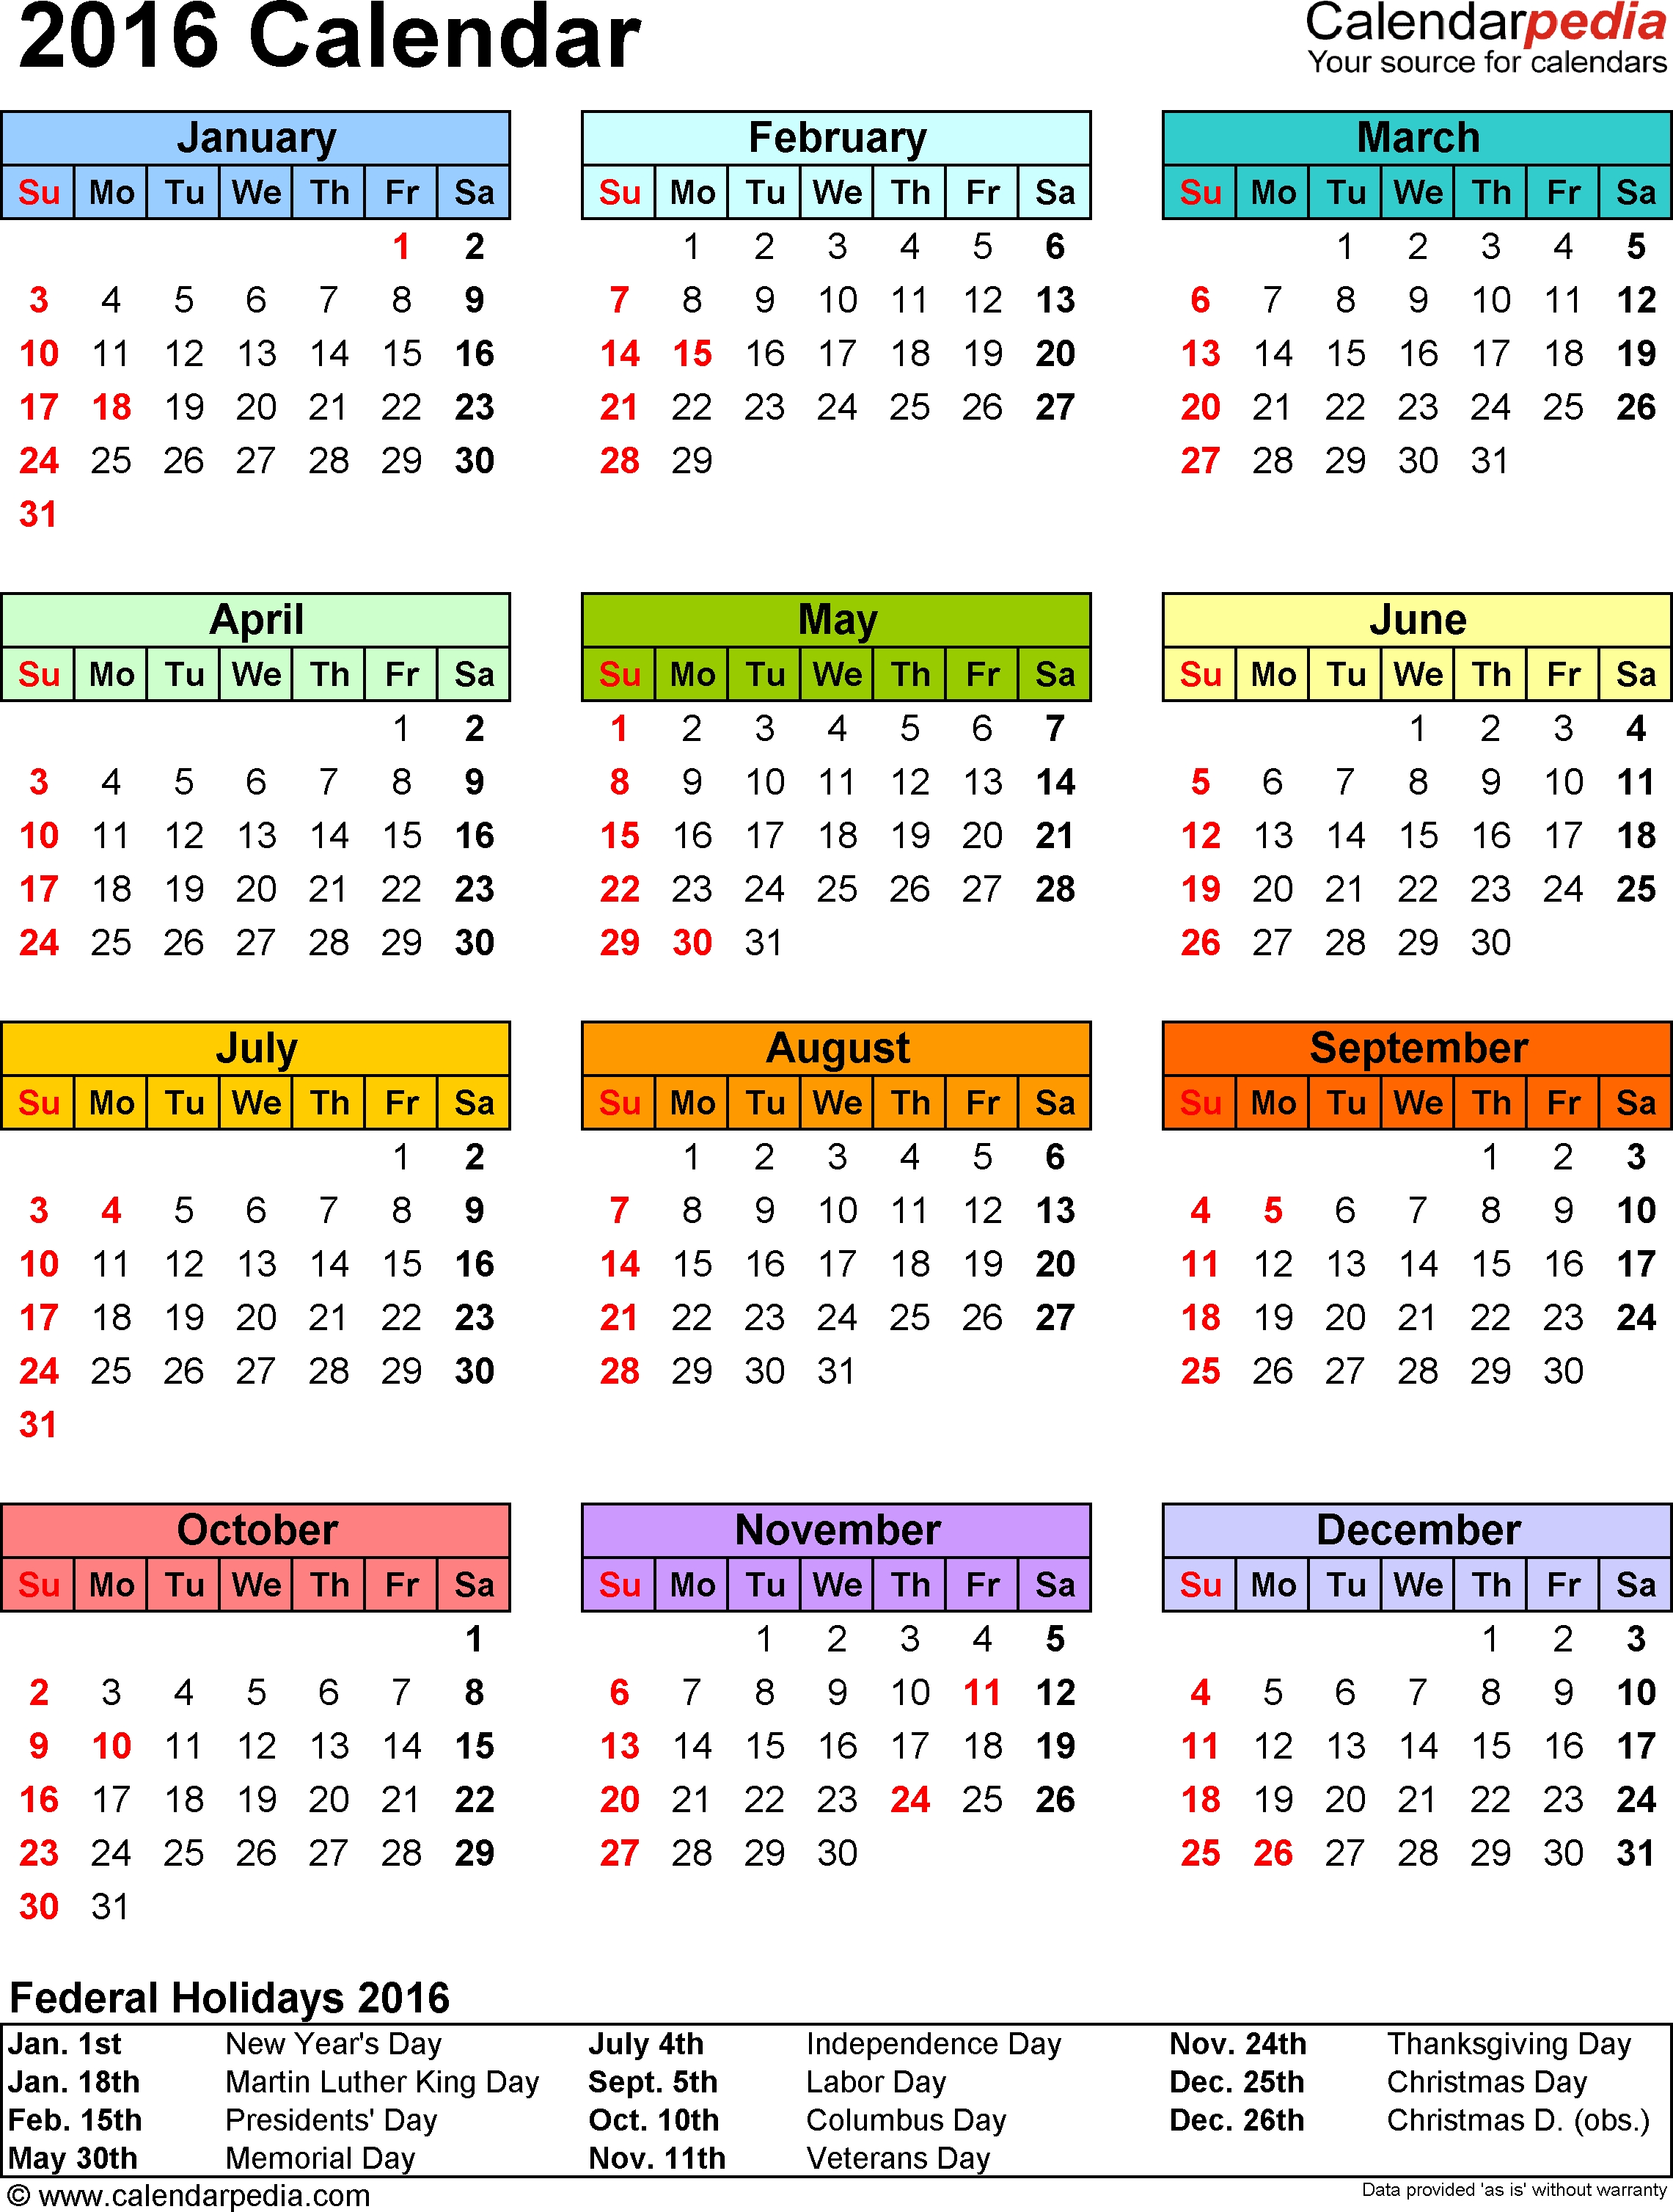 2016 Calendar - Download 16 Free Printable Excel Templates